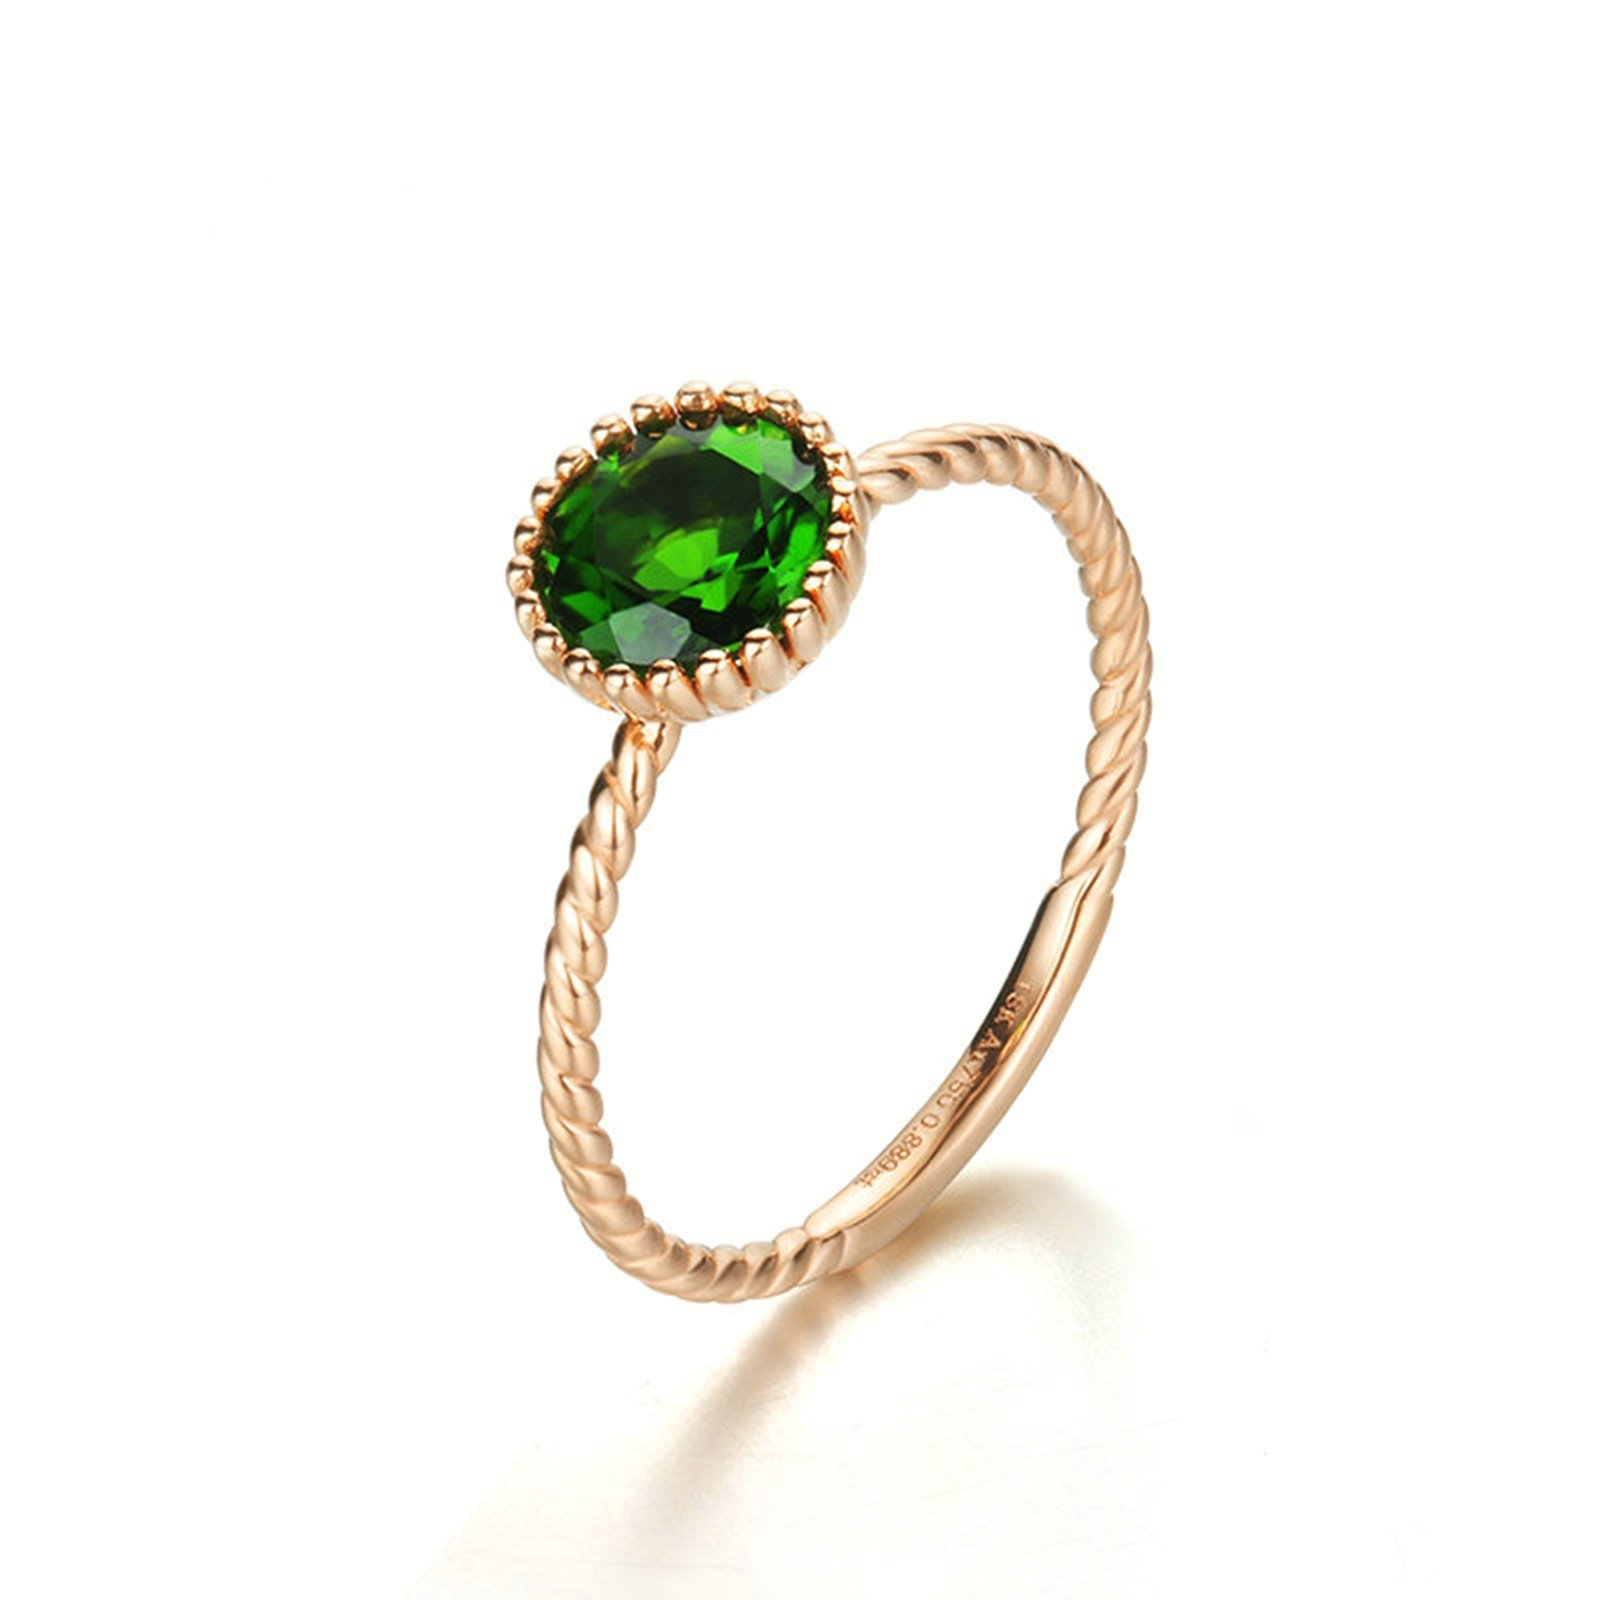 Daesar Gold Rings 18K for Women Spiral Rounded 6MM Green Gem Engagement Promise Ring Size 10 by Daesar